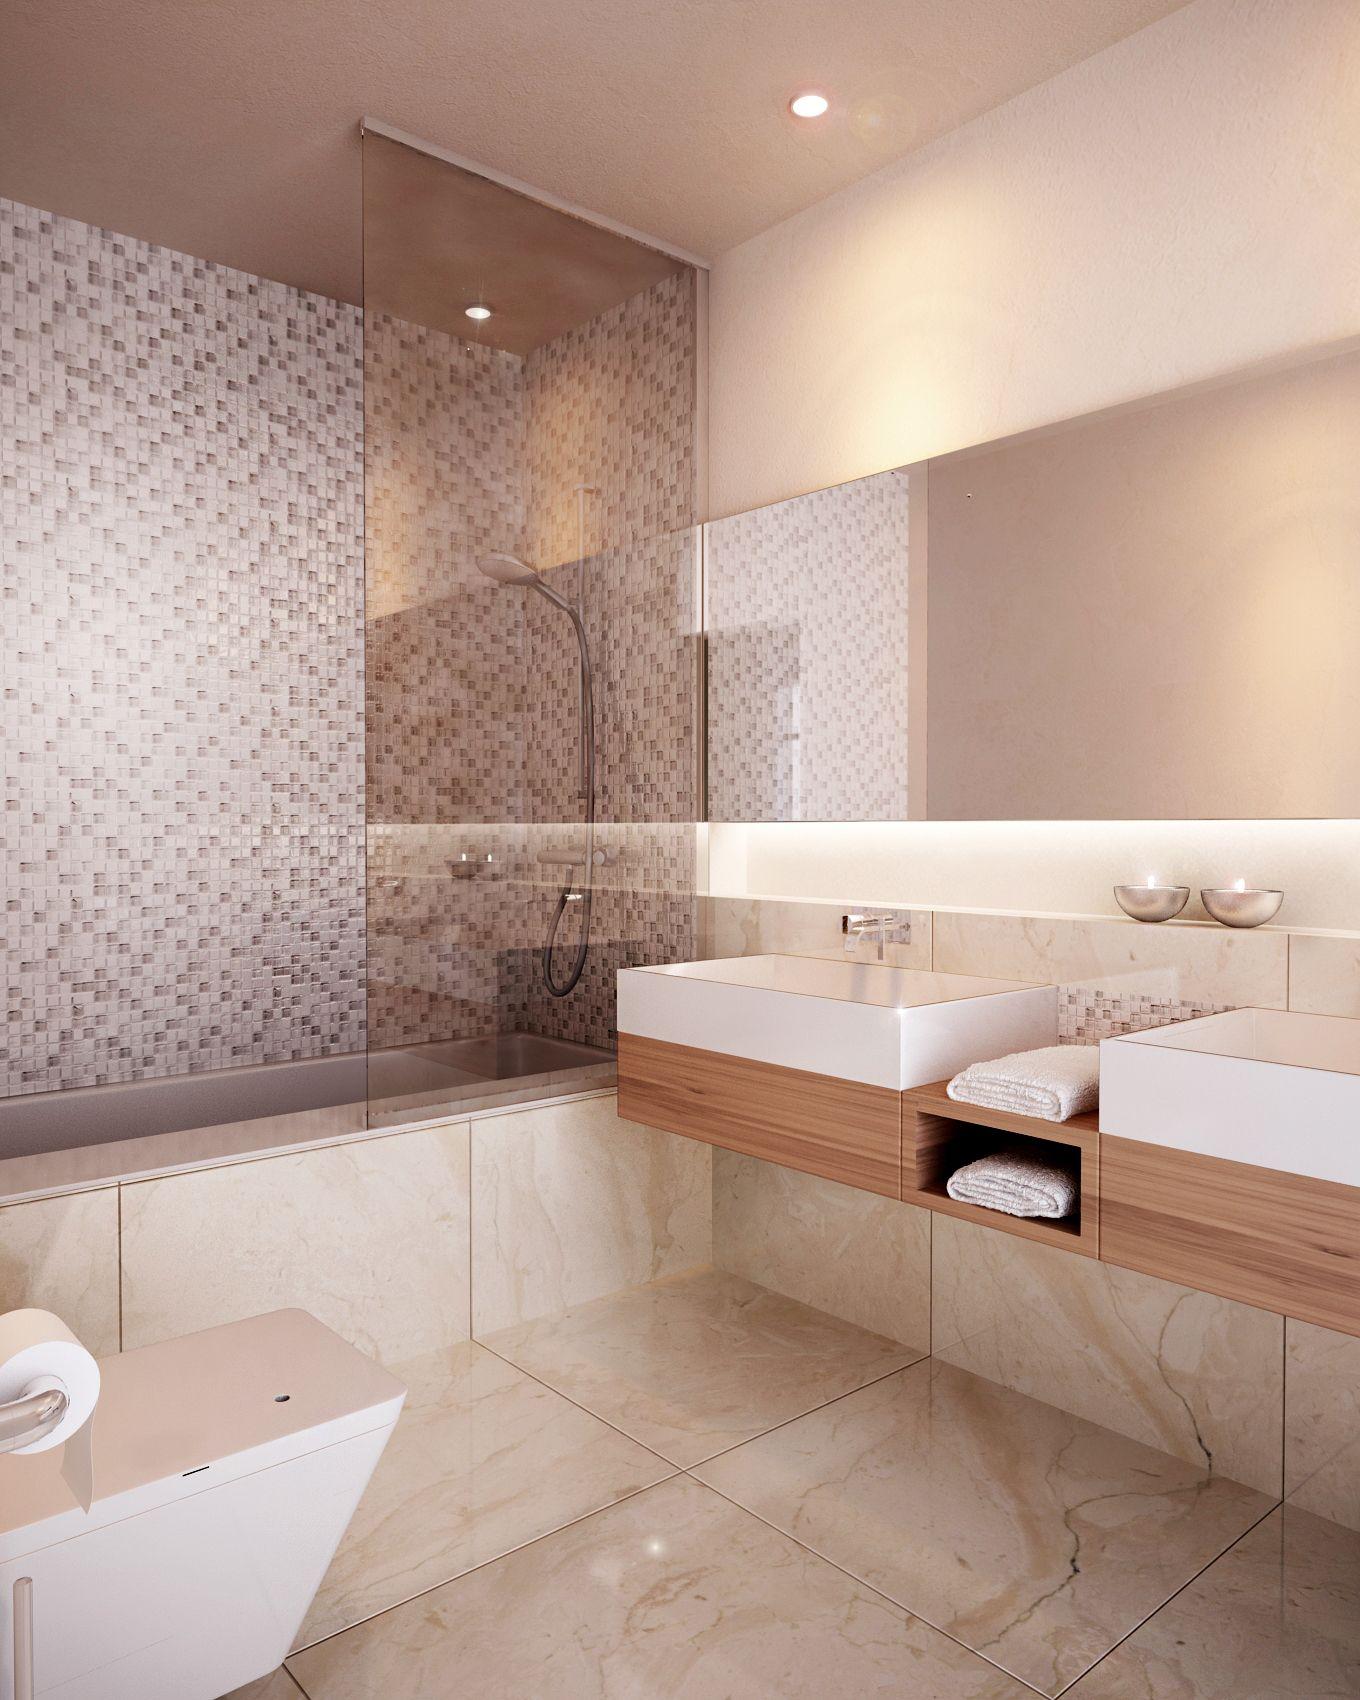 #bathroom, #modernbathroom, #modern #spanish #style